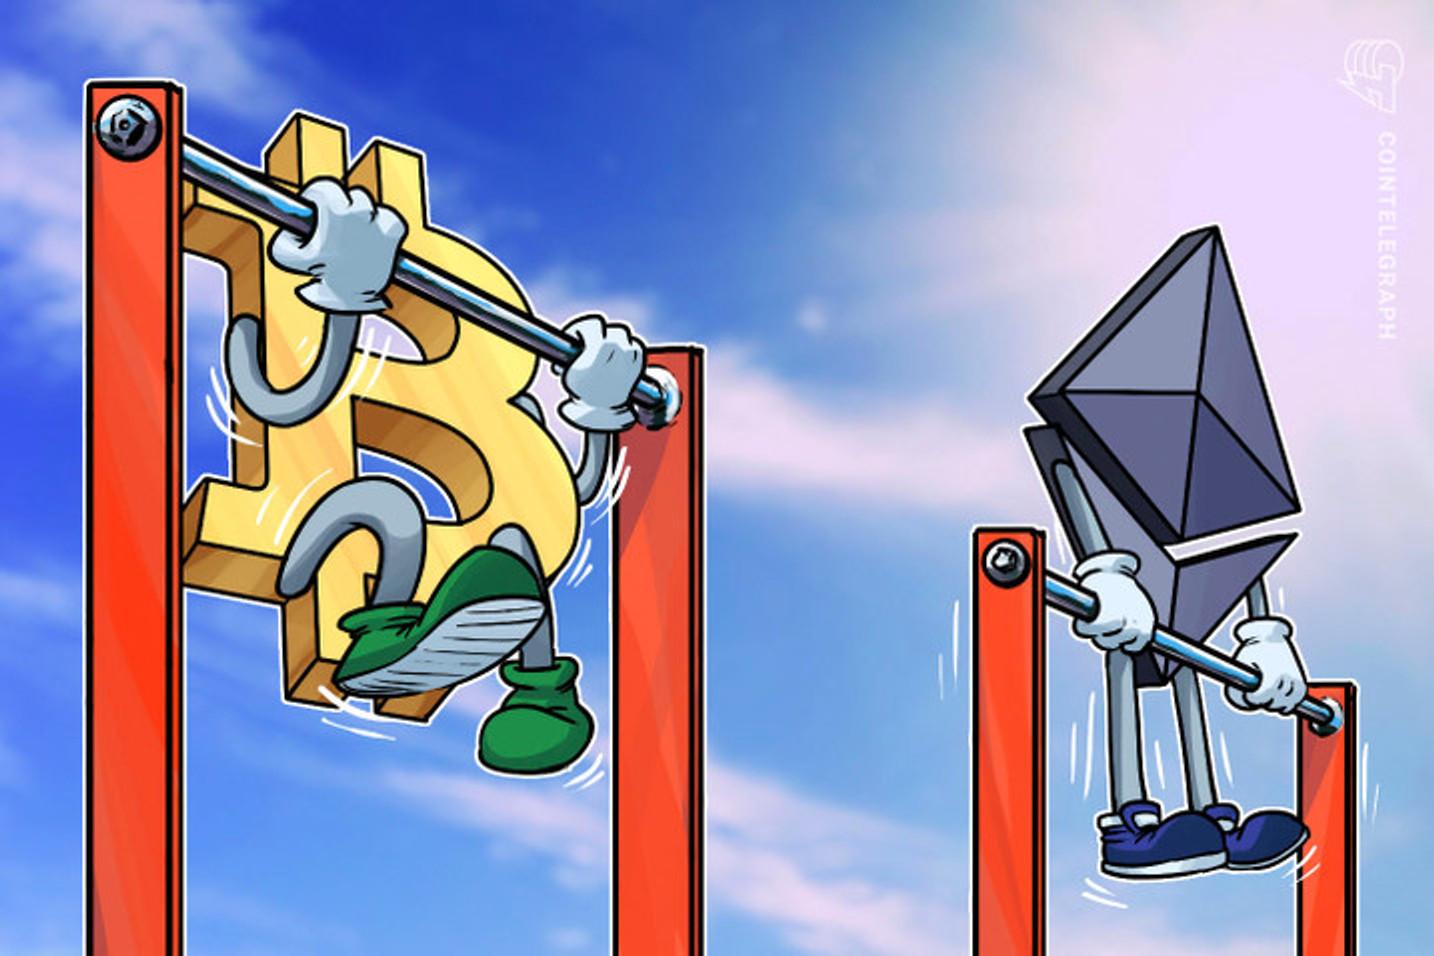 Brasileiros falam sobre o Flipping, dia em que o Bitcoin será coisa do passado e deixará de ser a principal criptomoeda do mercado